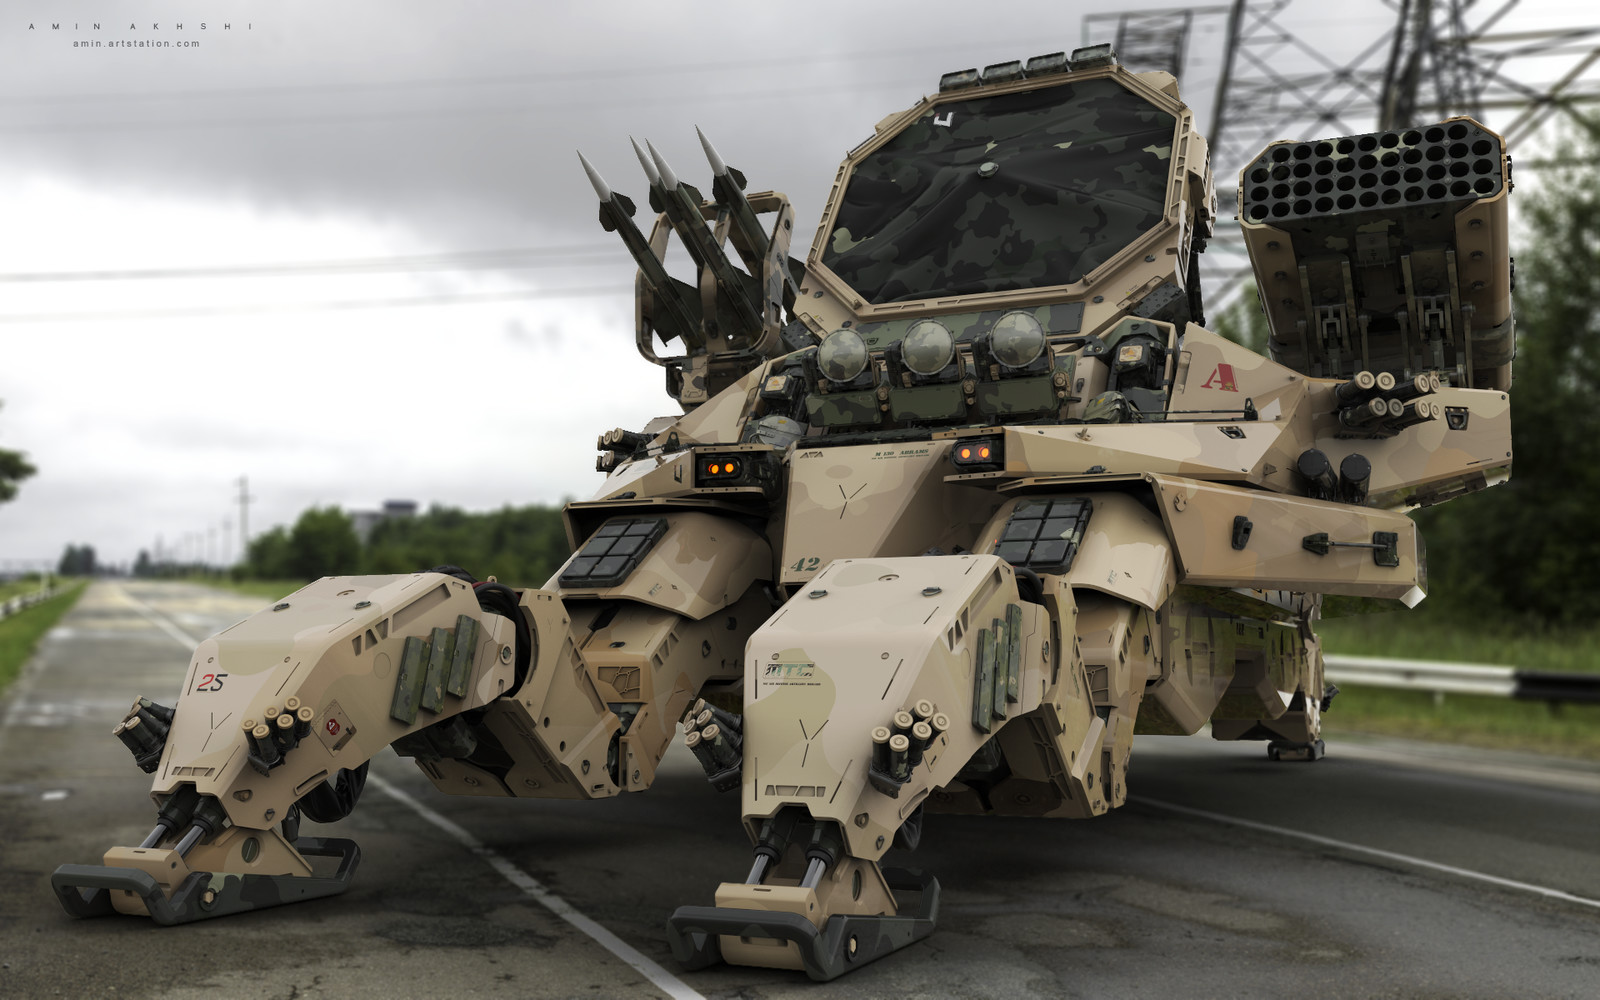 M130 Abrams, 108th Air Defense Artillery Brigade